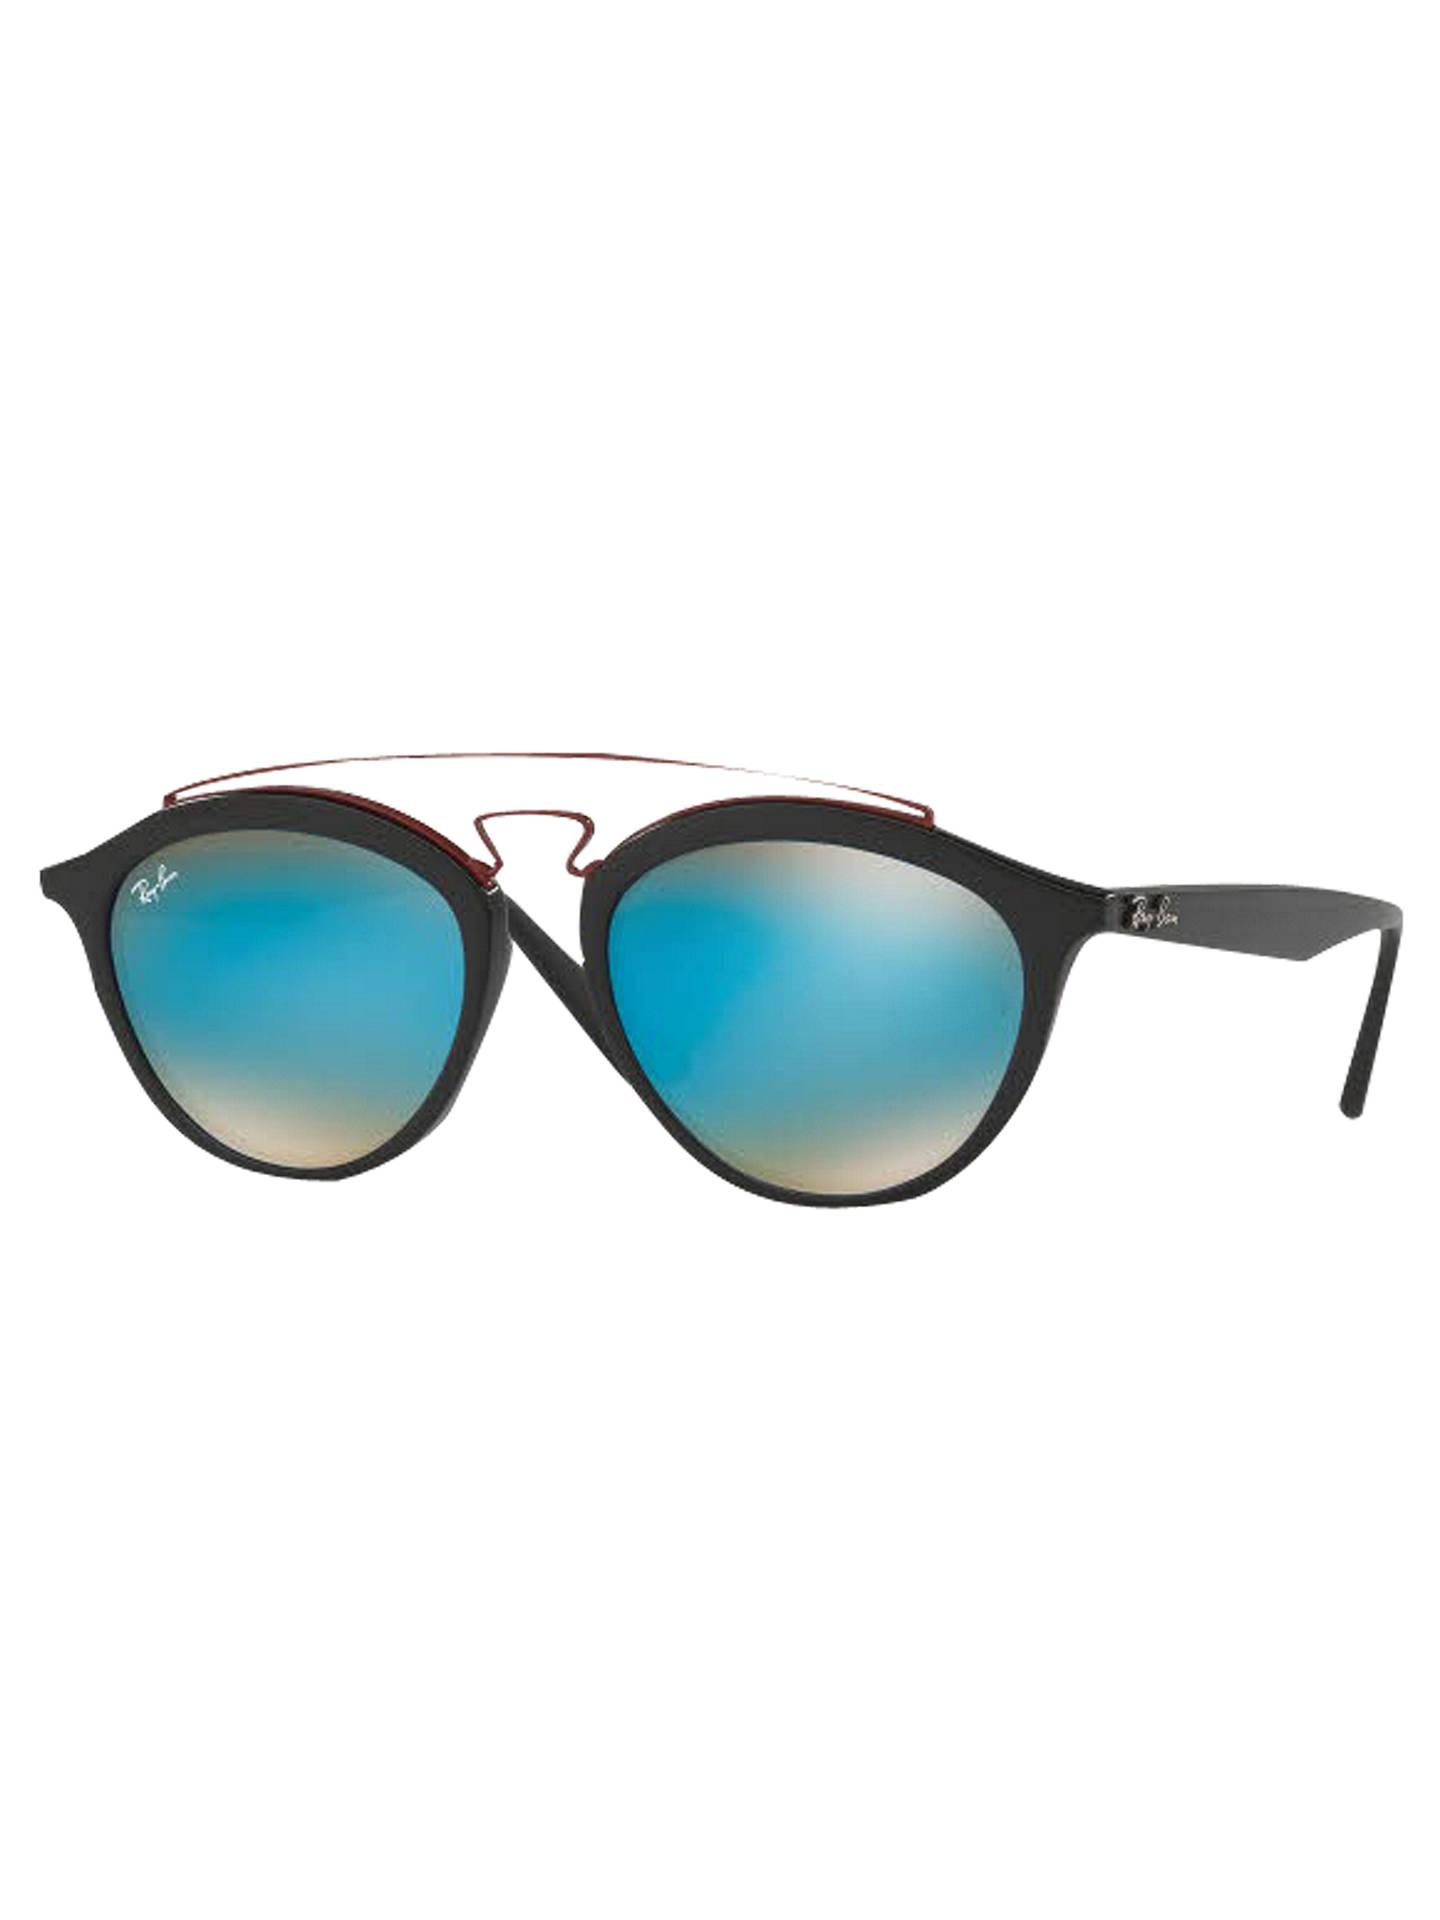 00e178f3fb9 BuyRay-Ban RB4257 Oval Sunglasses